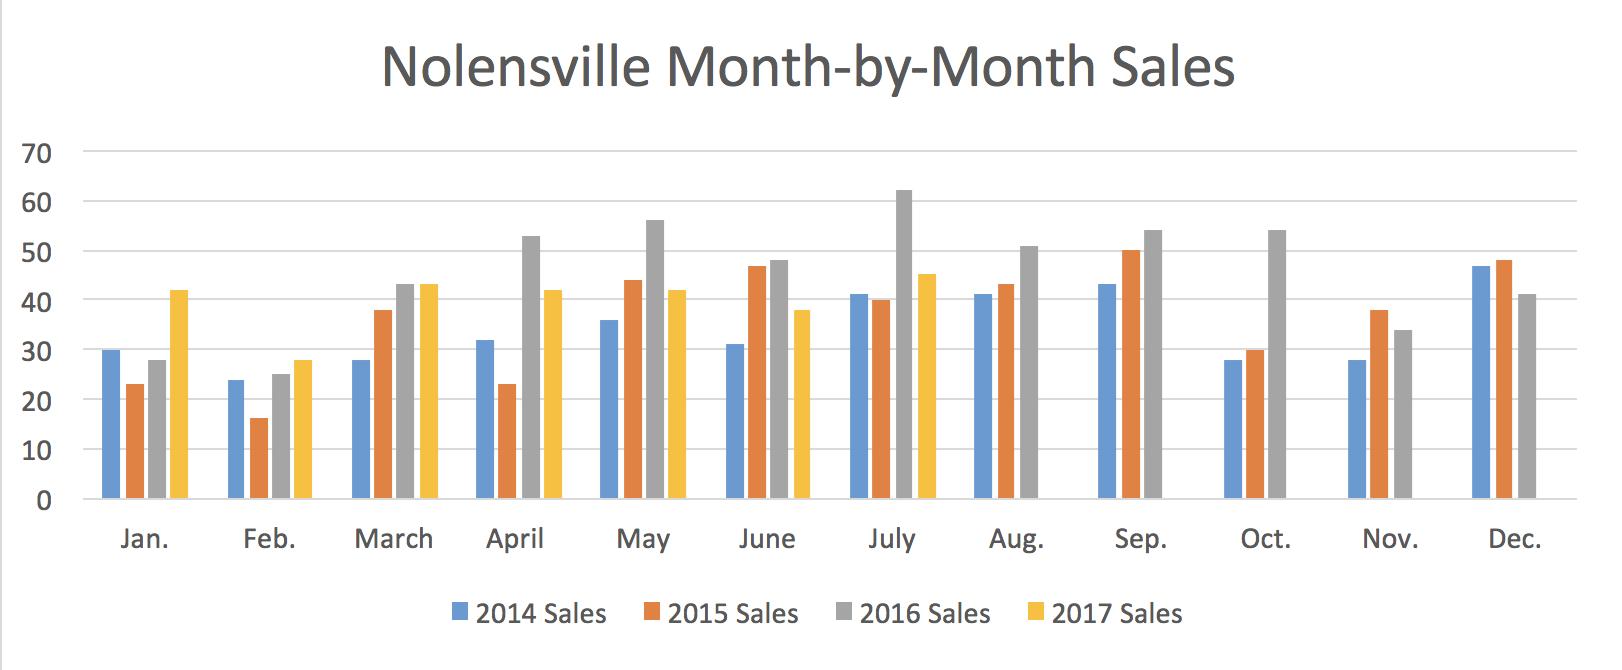 Nolensville Month-by-Month Sales July 2017